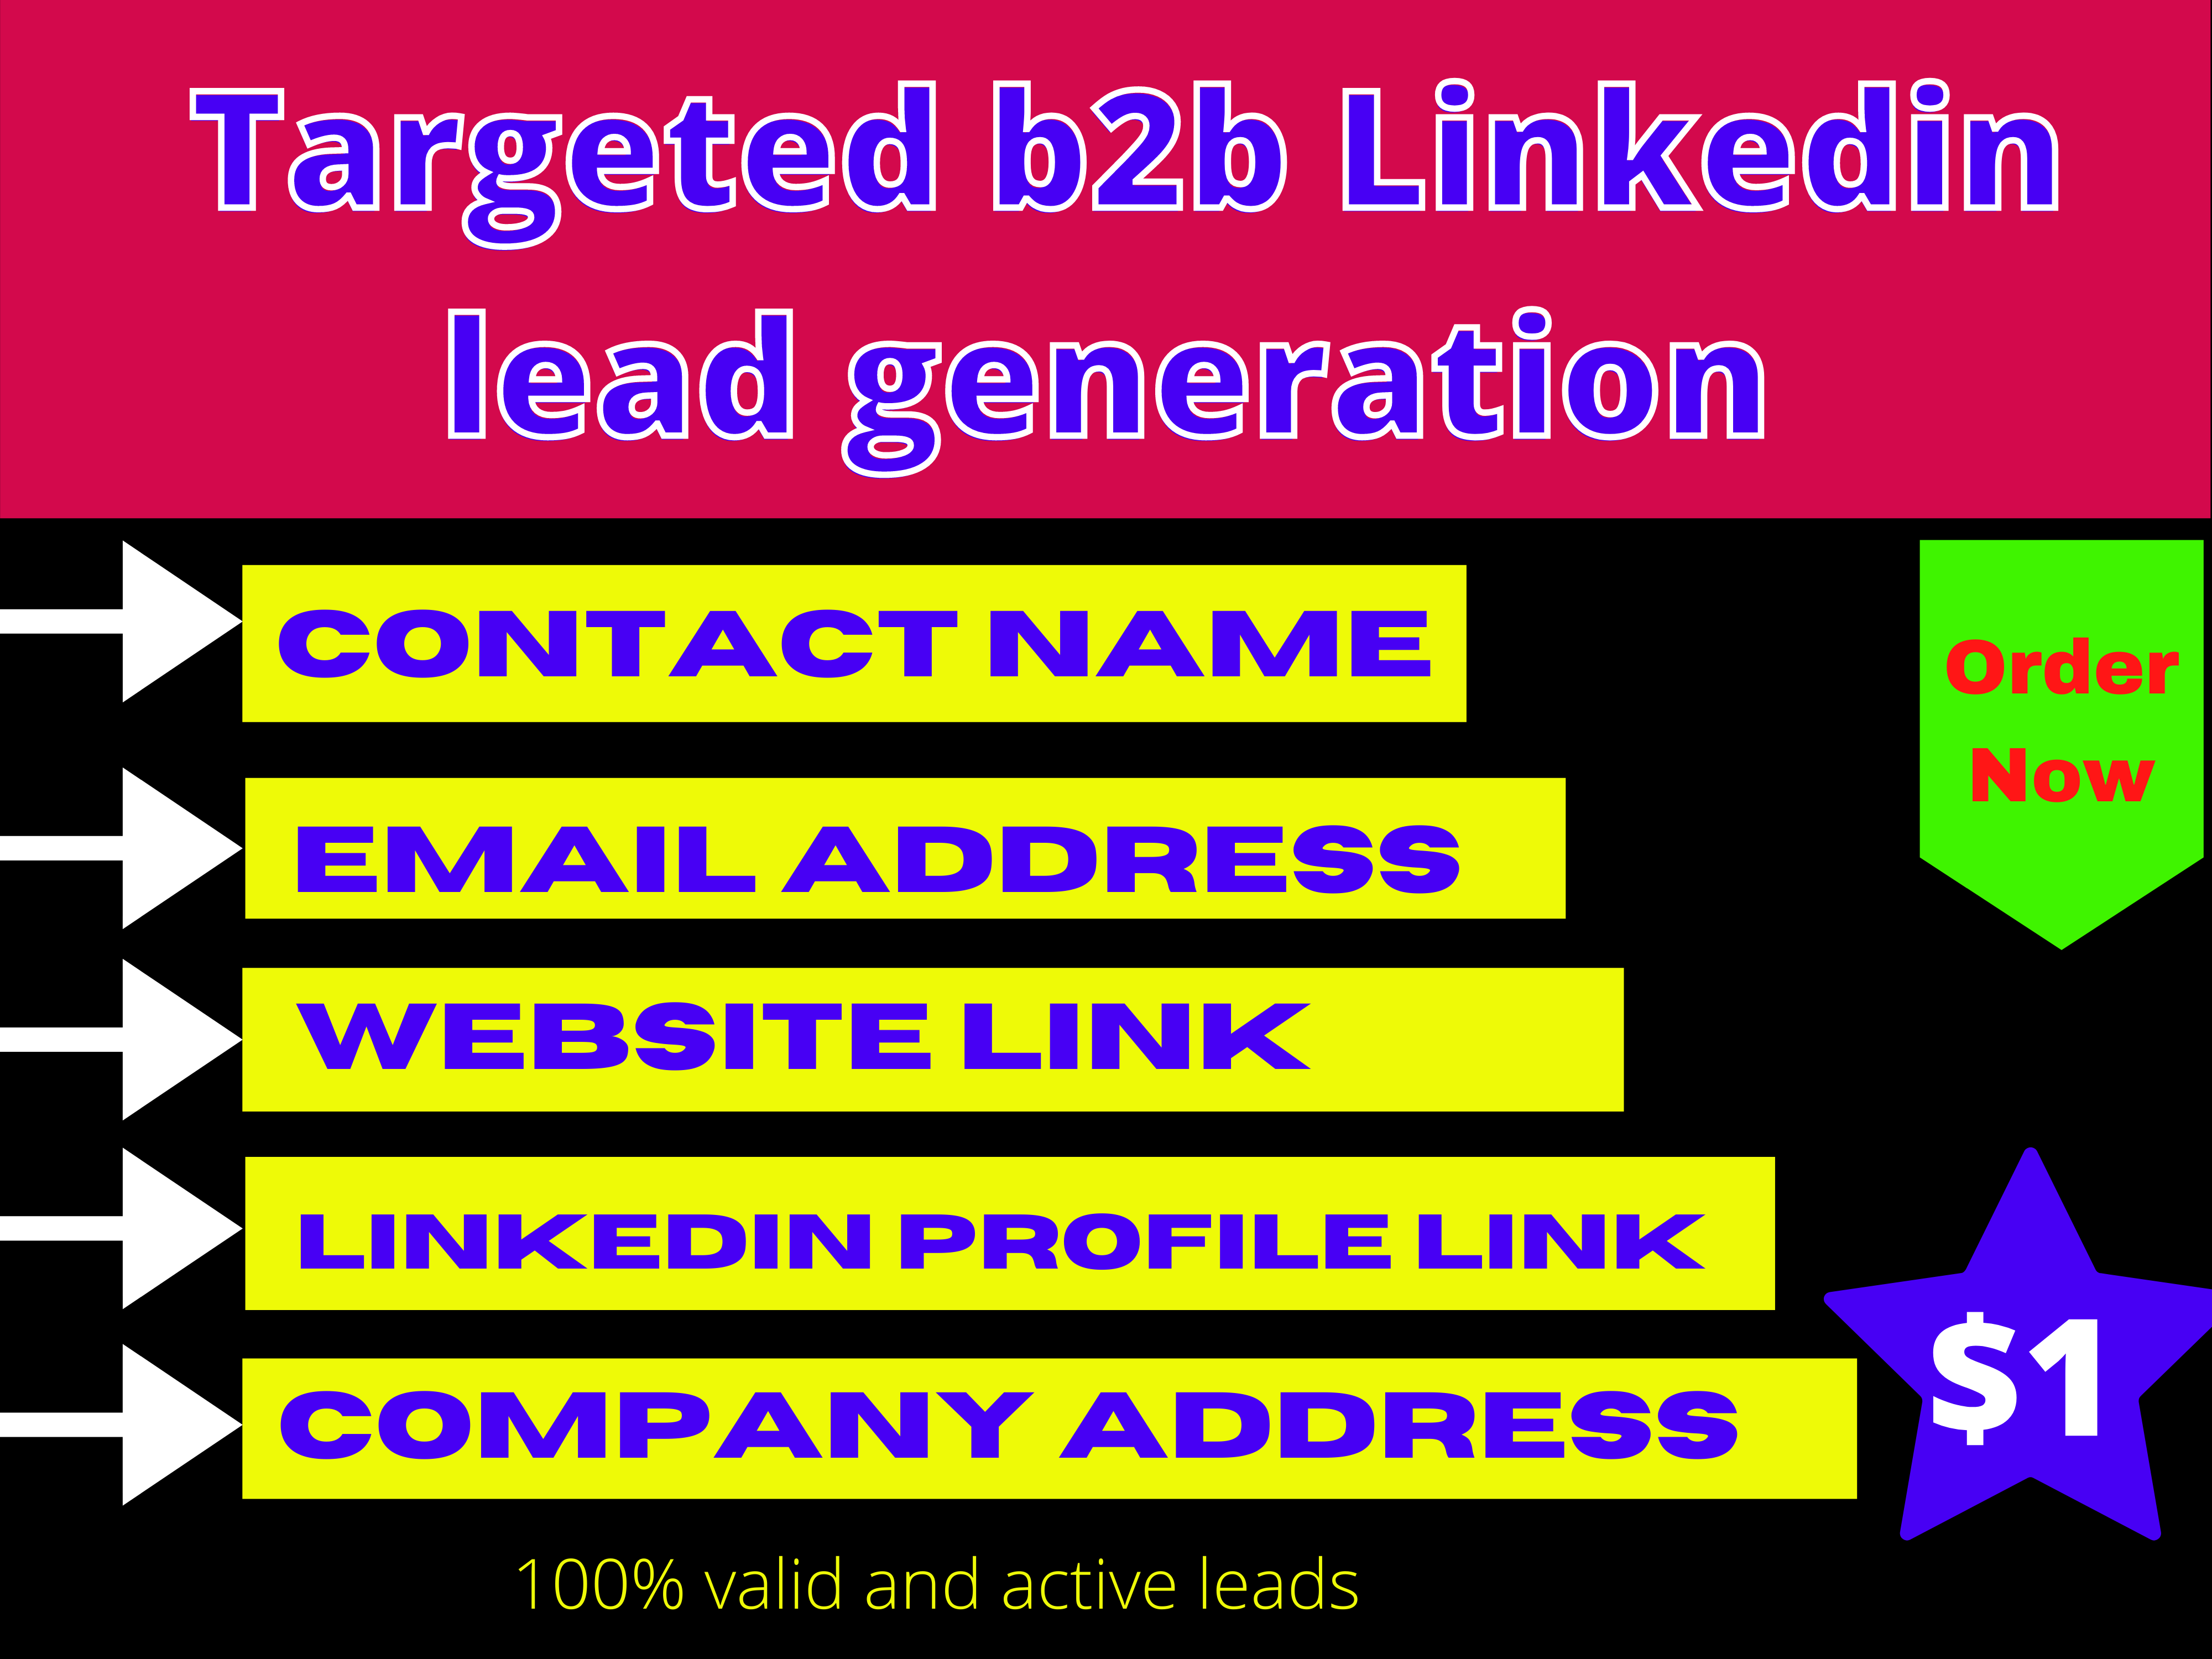 I will do 10 targeted b2b Linkedin lead generation